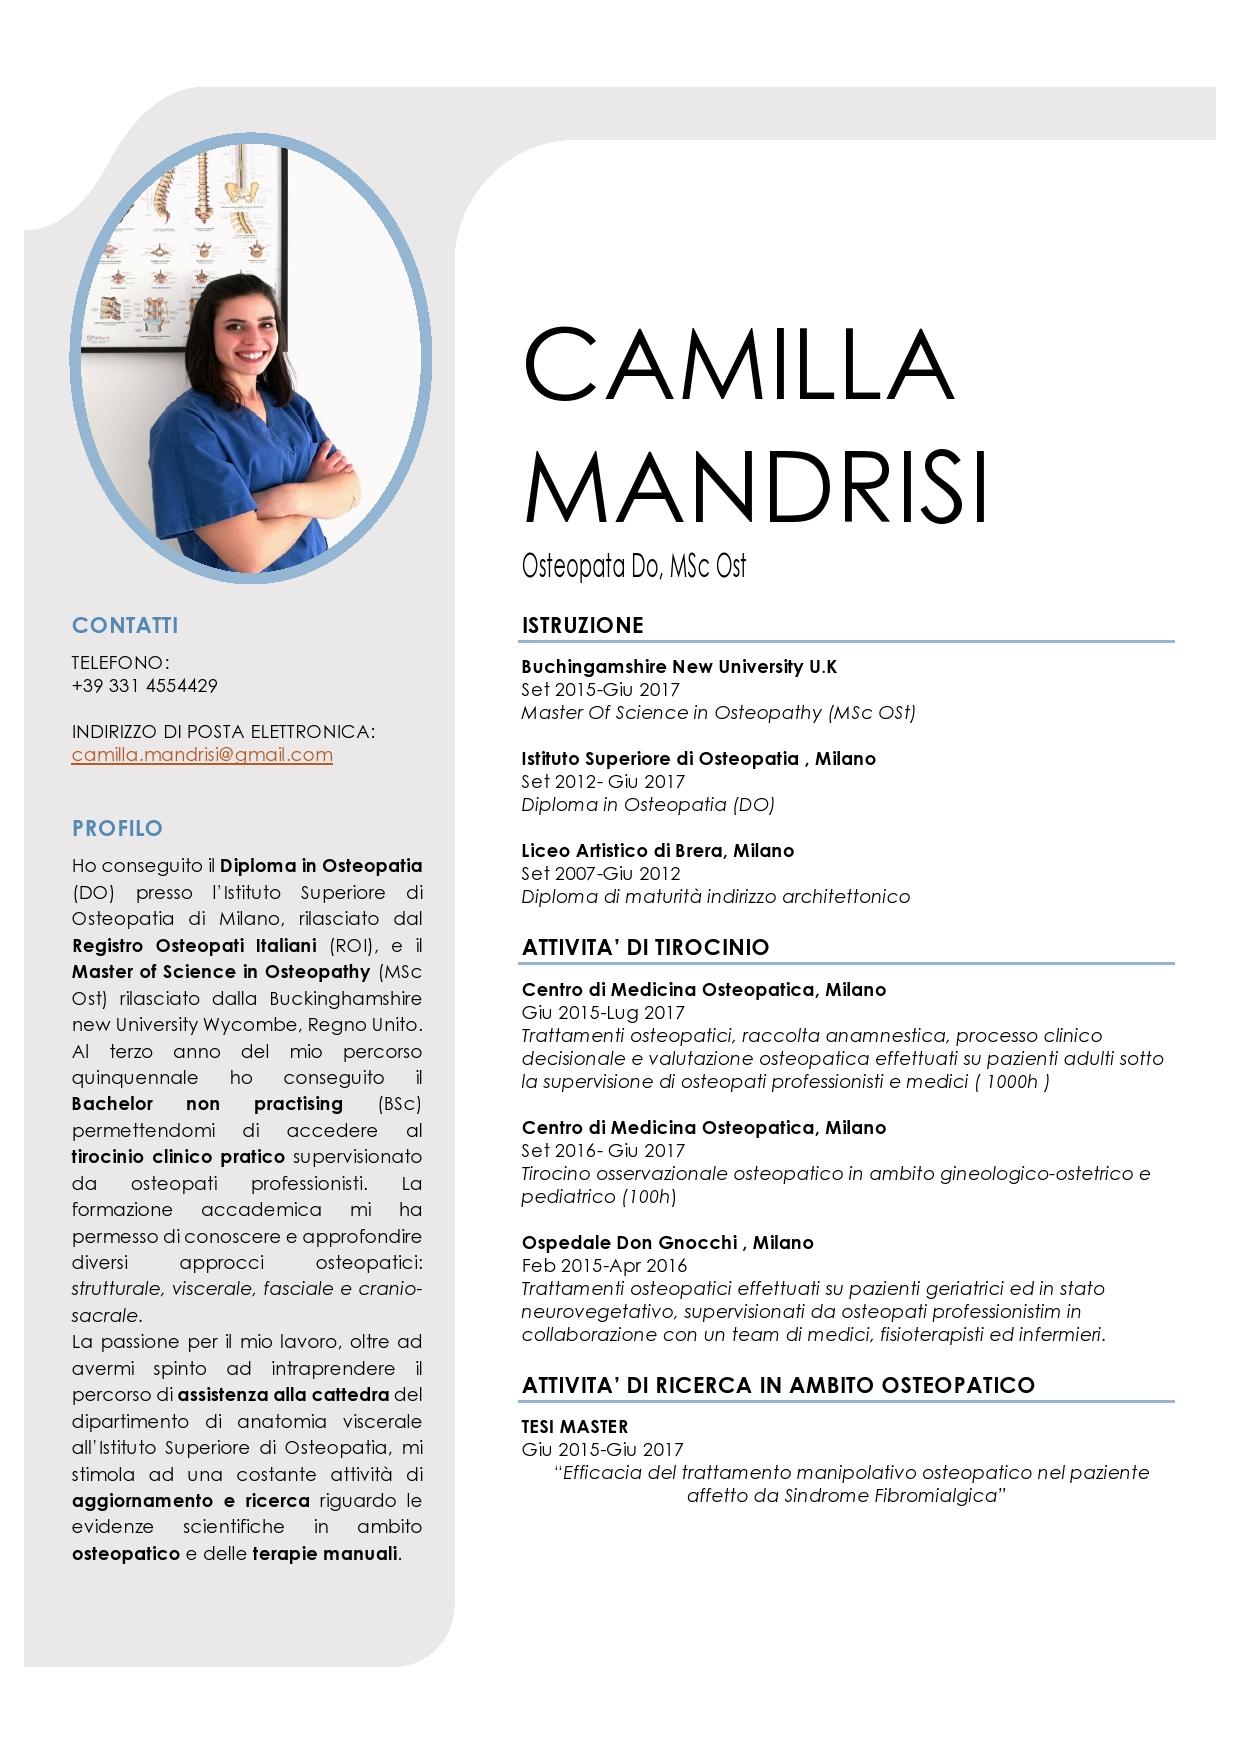 Camilla Mandrisi